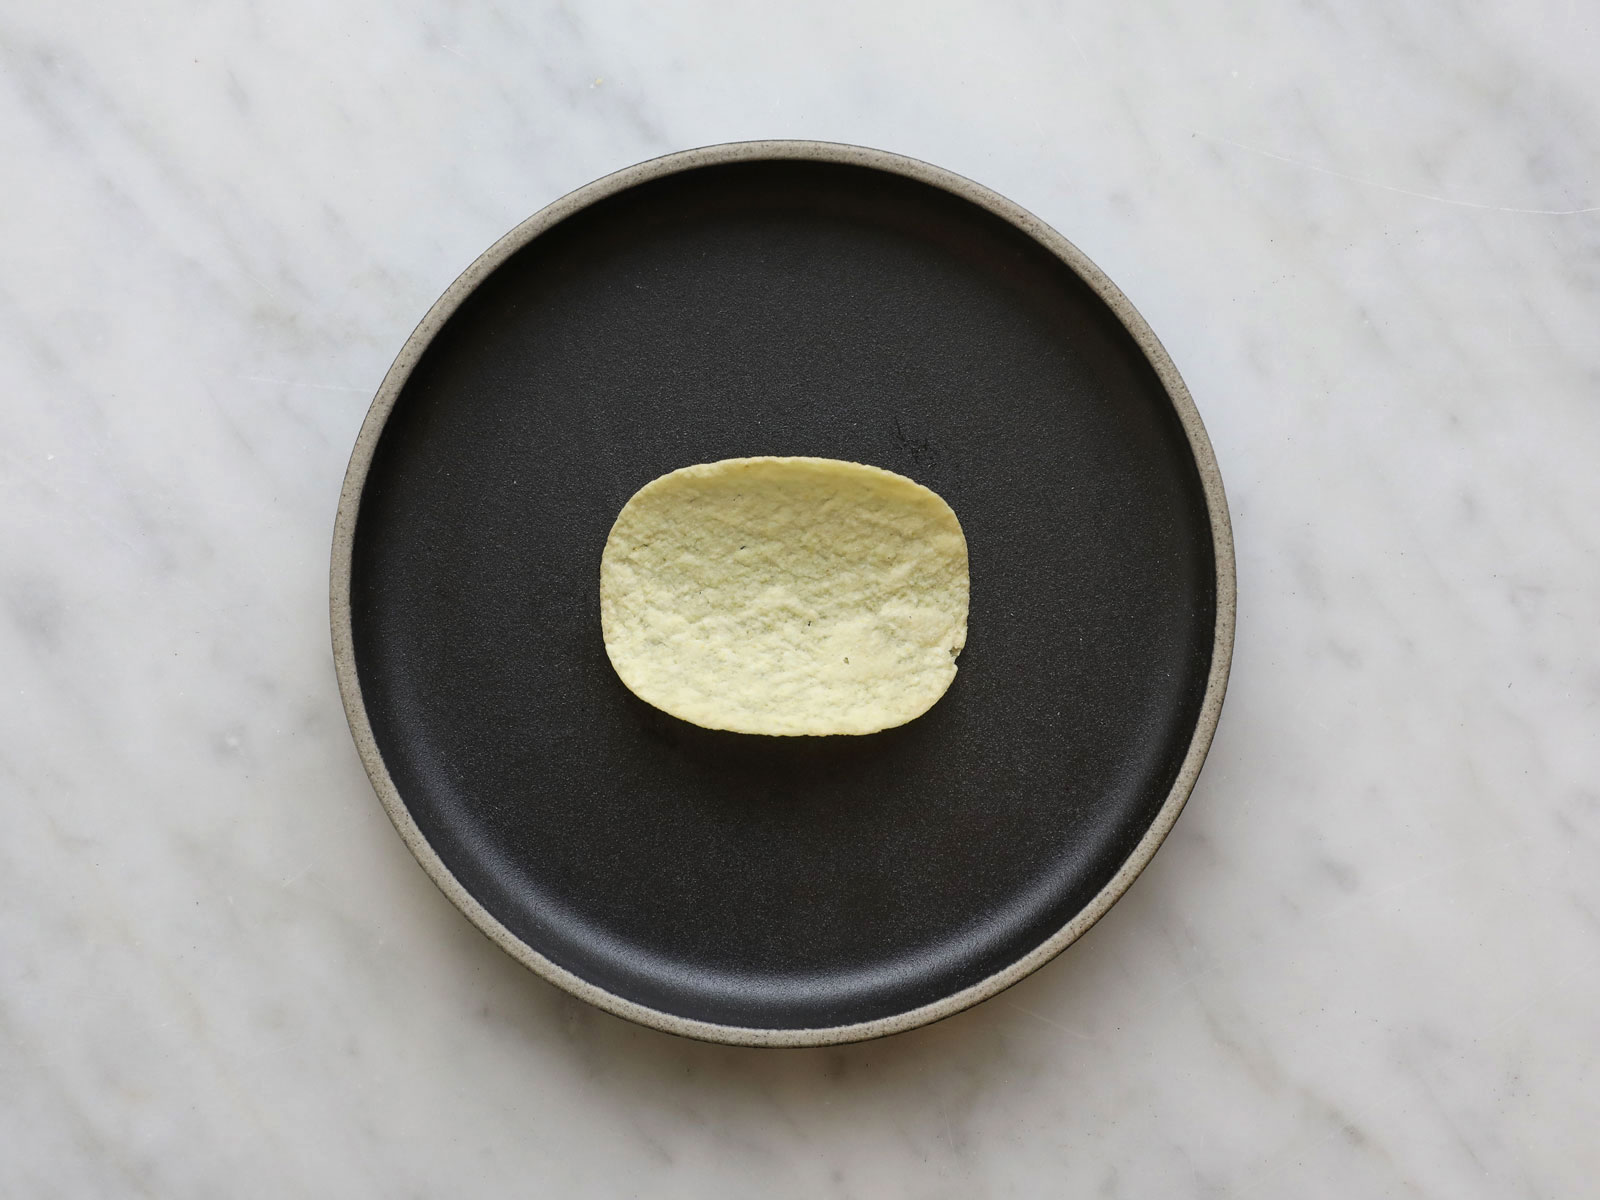 Original Lightly Salted Pringles